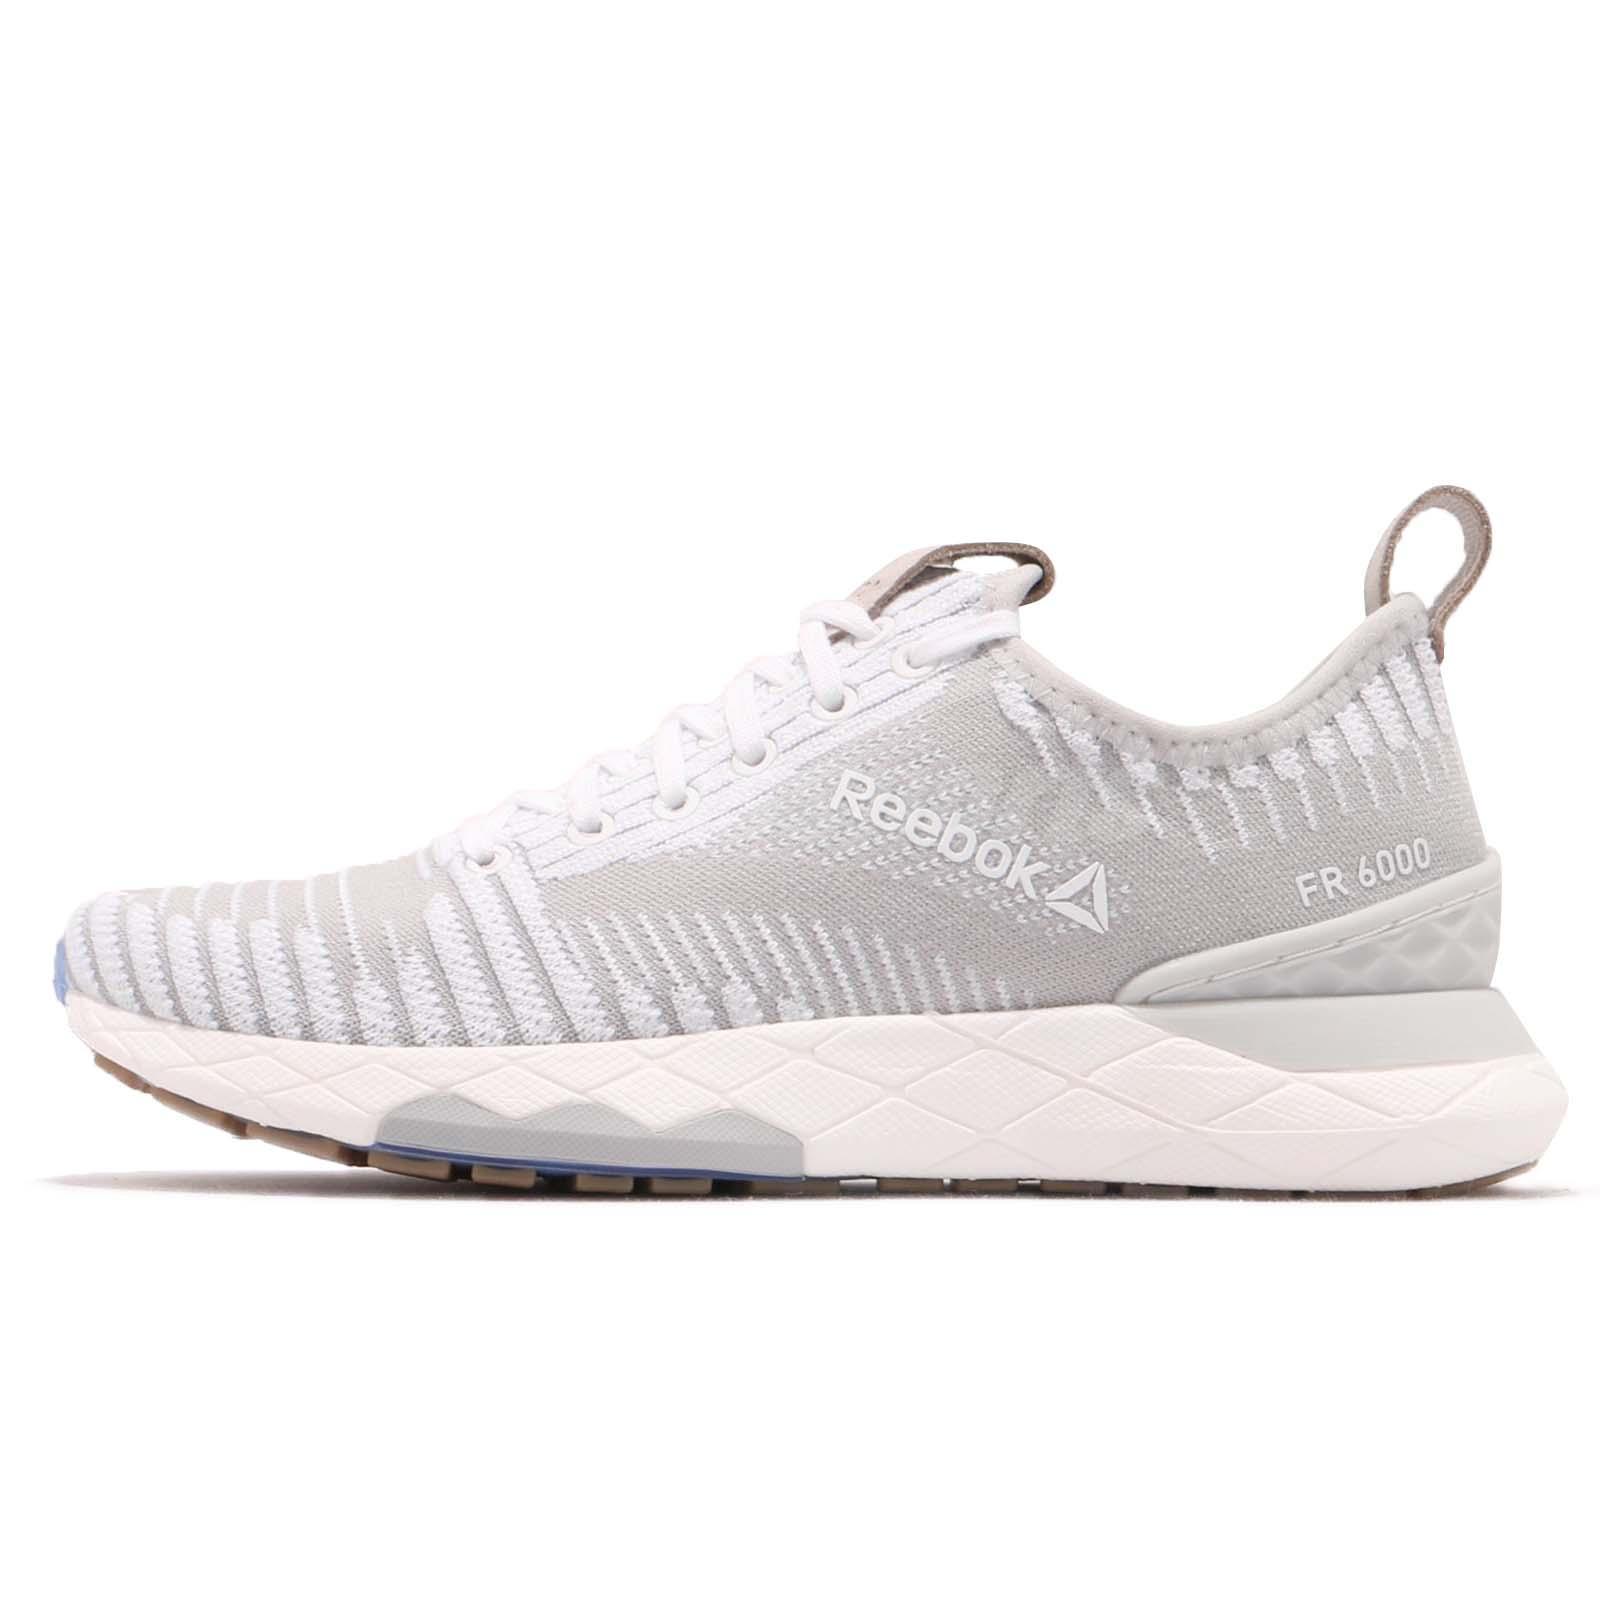 Reebok Floatride 6000 Ultraknit White Grey Stucco Women Running Shoes CN1763 27185ec02